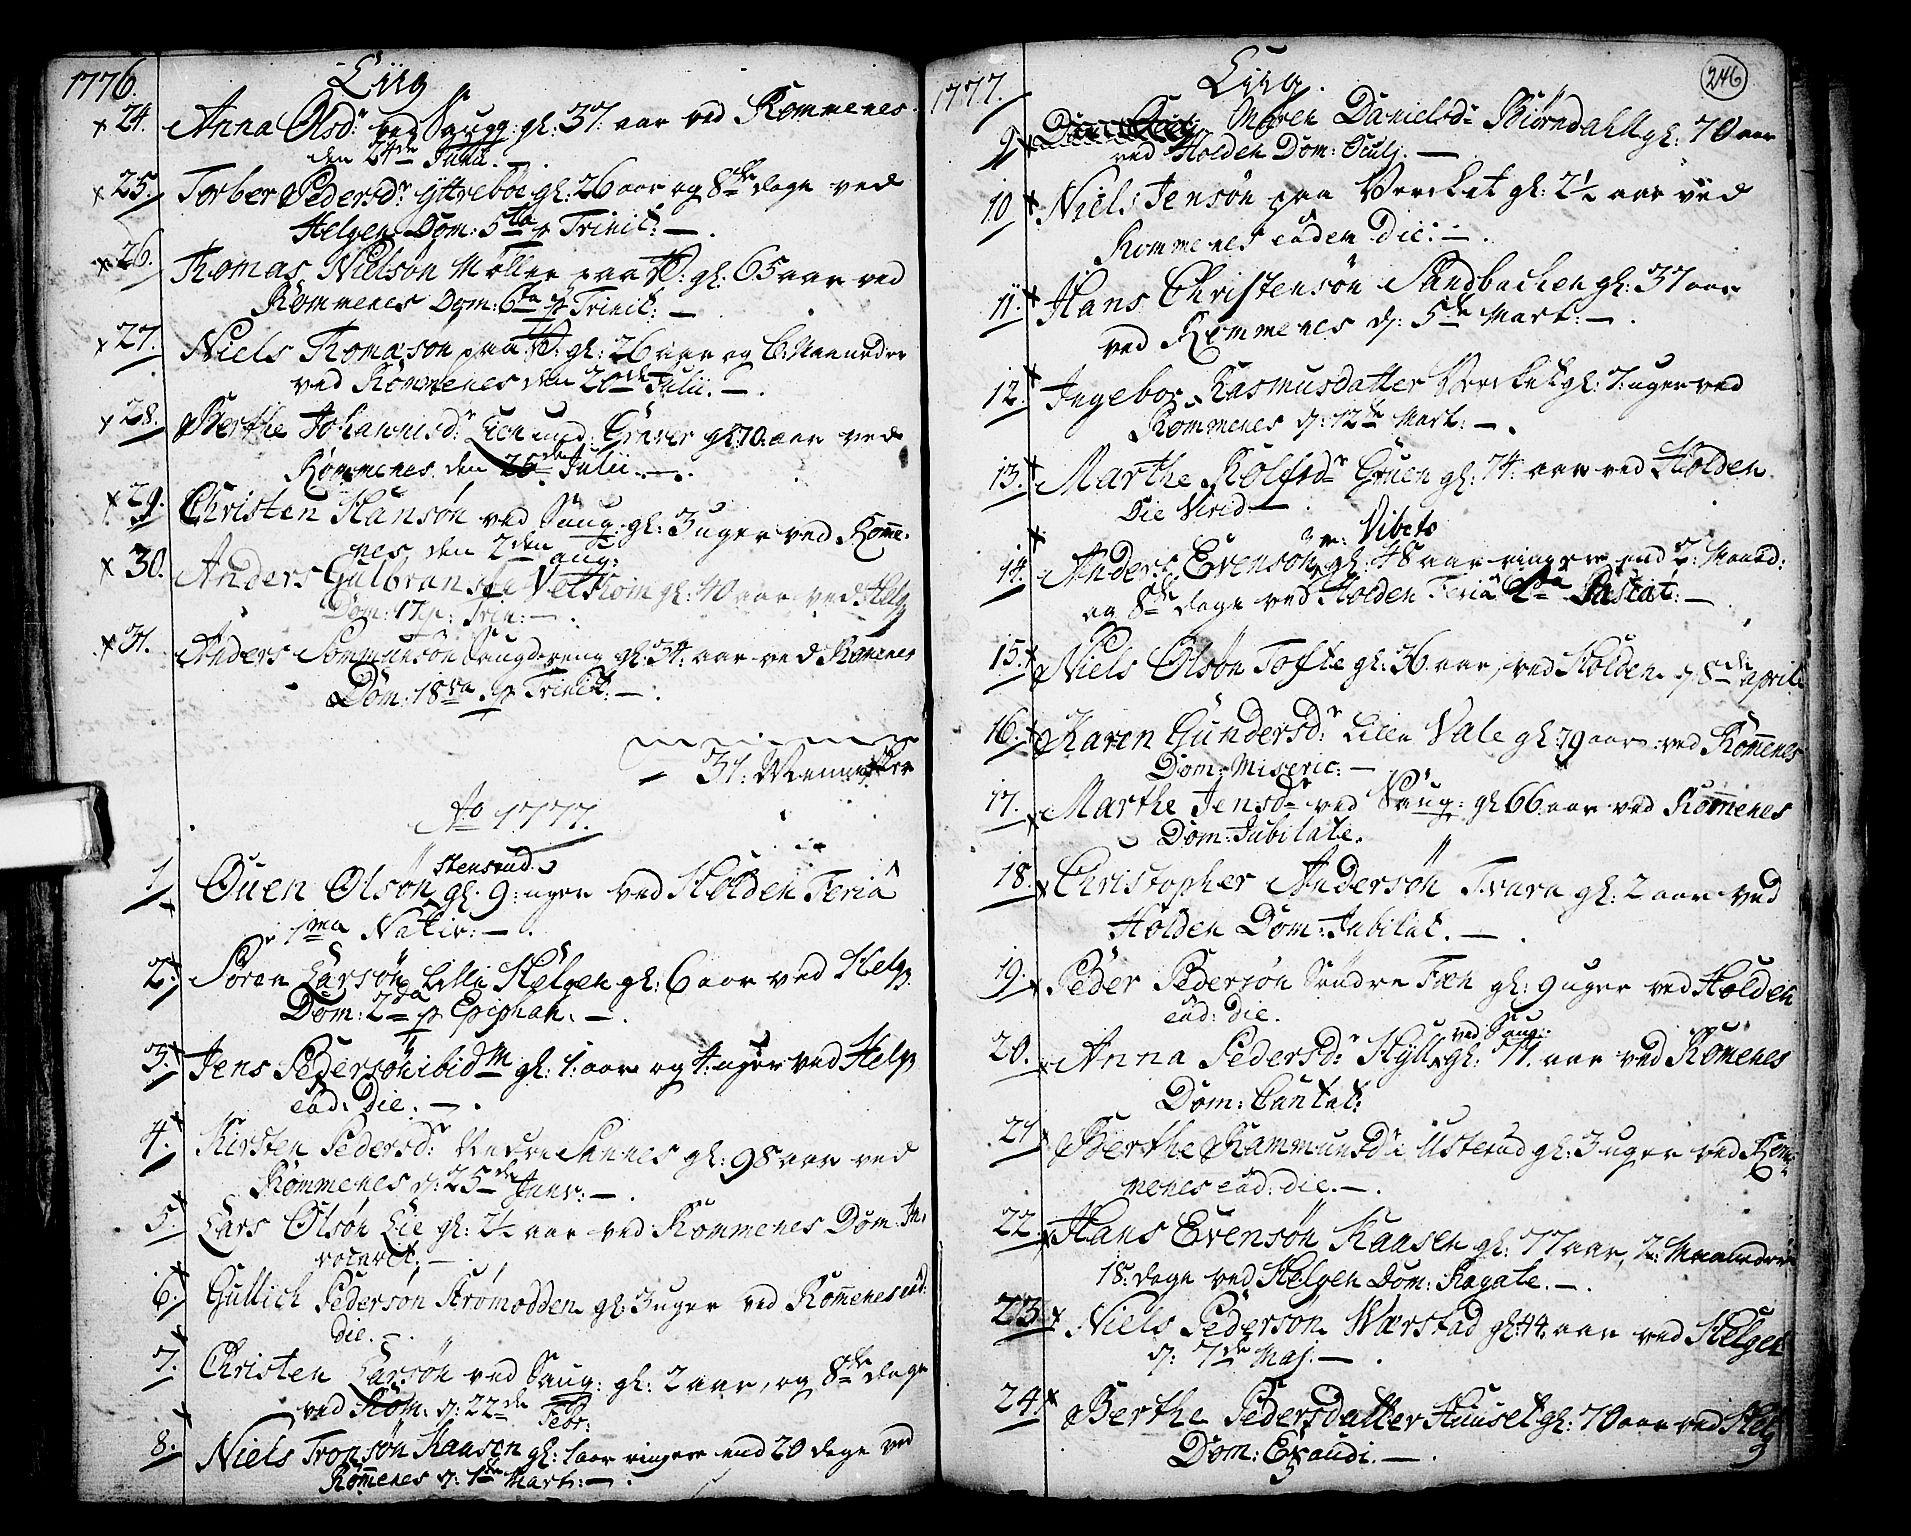 SAKO, Holla kirkebøker, F/Fa/L0001: Ministerialbok nr. 1, 1717-1779, s. 246